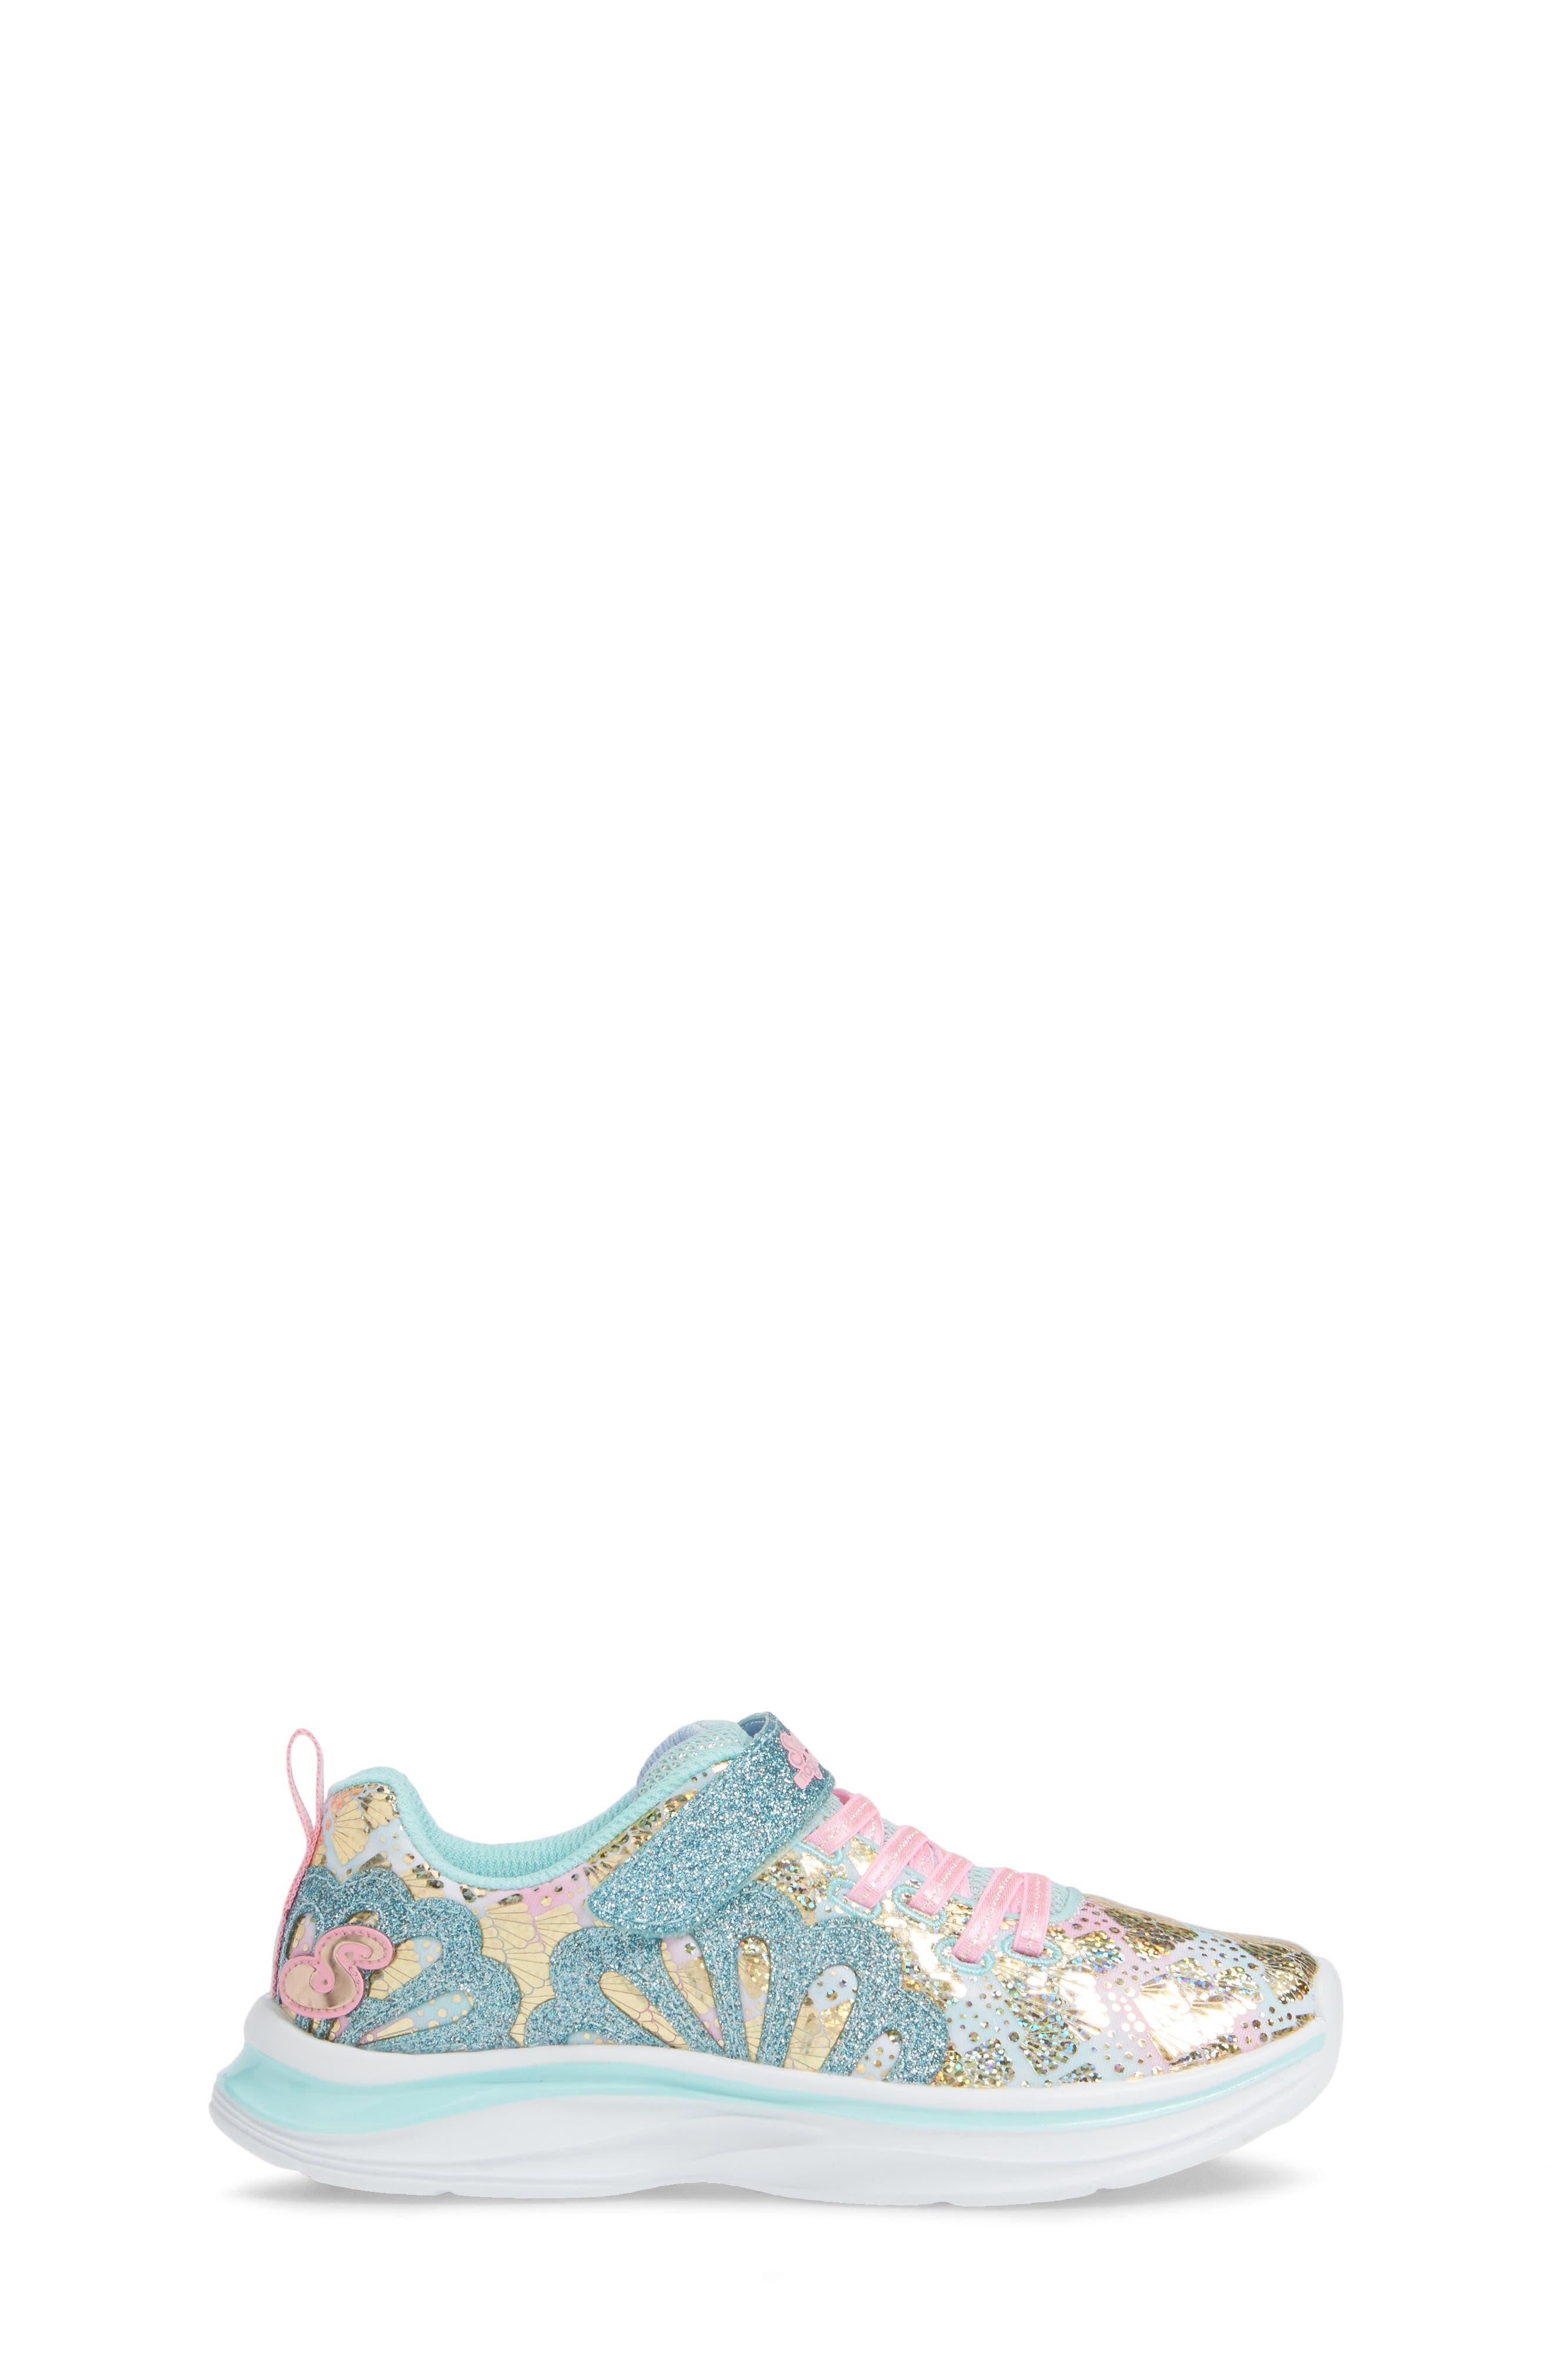 Double Dreams Shimmer Sneaker,                             Alternate thumbnail 3, color,                             AQUA/ PINK TEXTILE